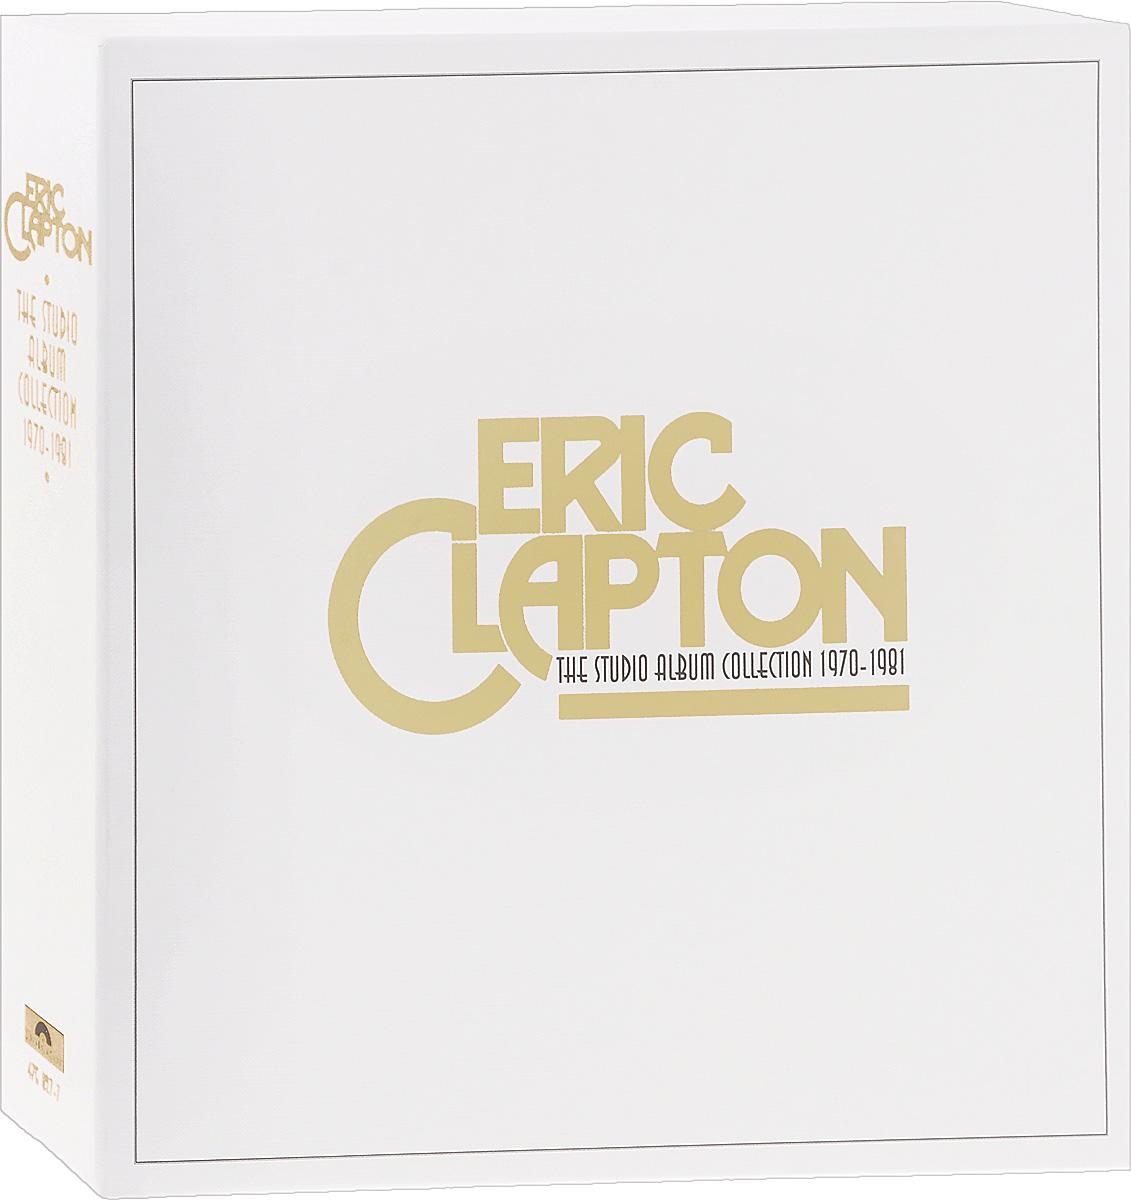 Эрик Клэптон Eric Clapton. The Studio Album Collection. 1970-1981 (9 LP) eric clapton eric clapton give me strength 3 lp